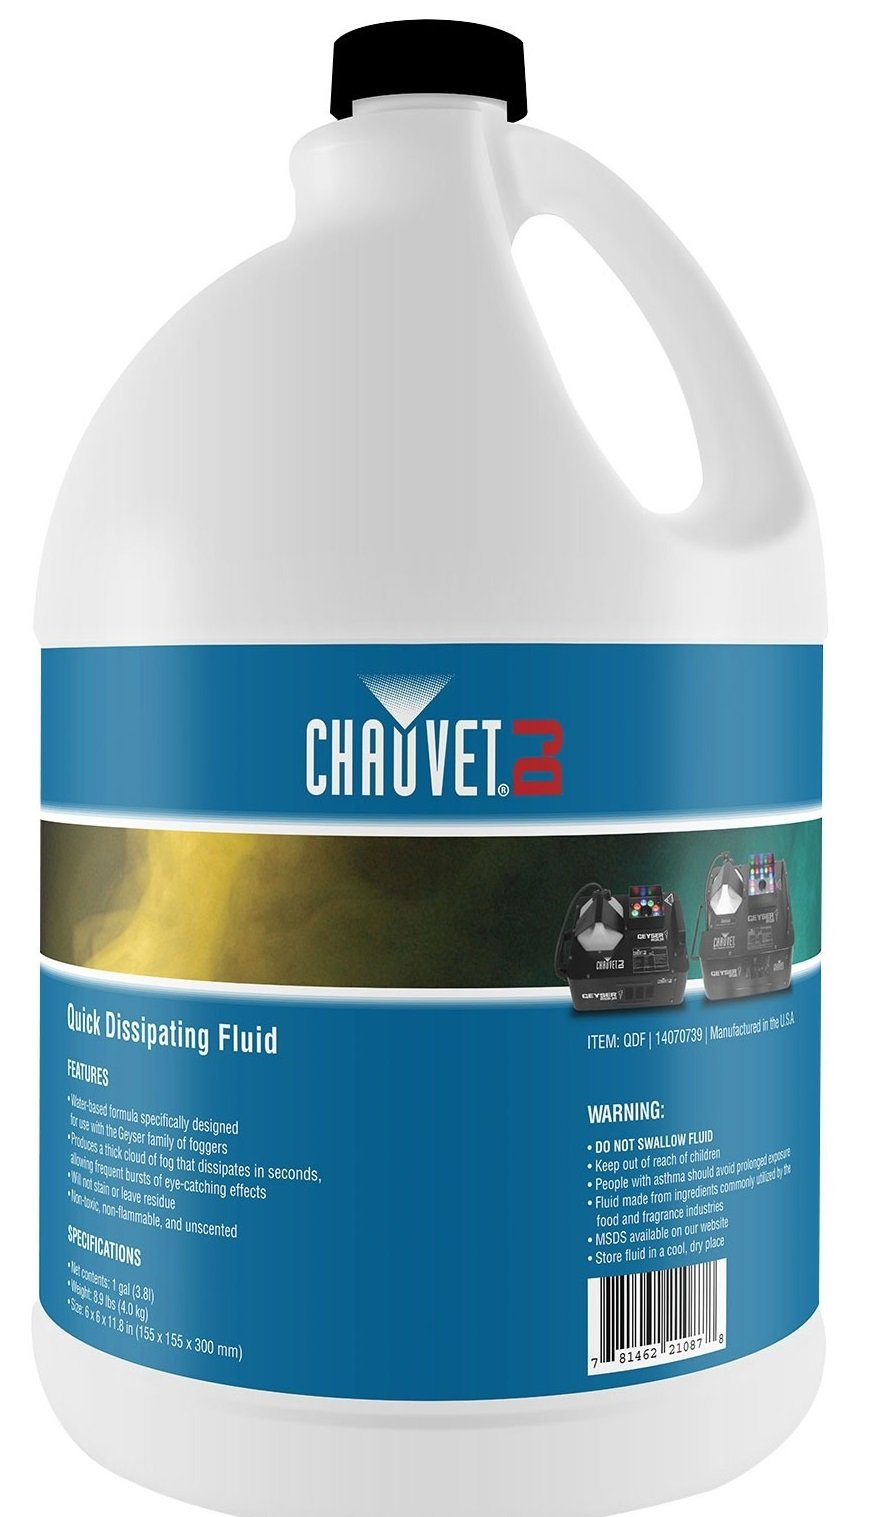 chauvet-qdf-fog-fluid-gallon-quick-dissipating.jpeg